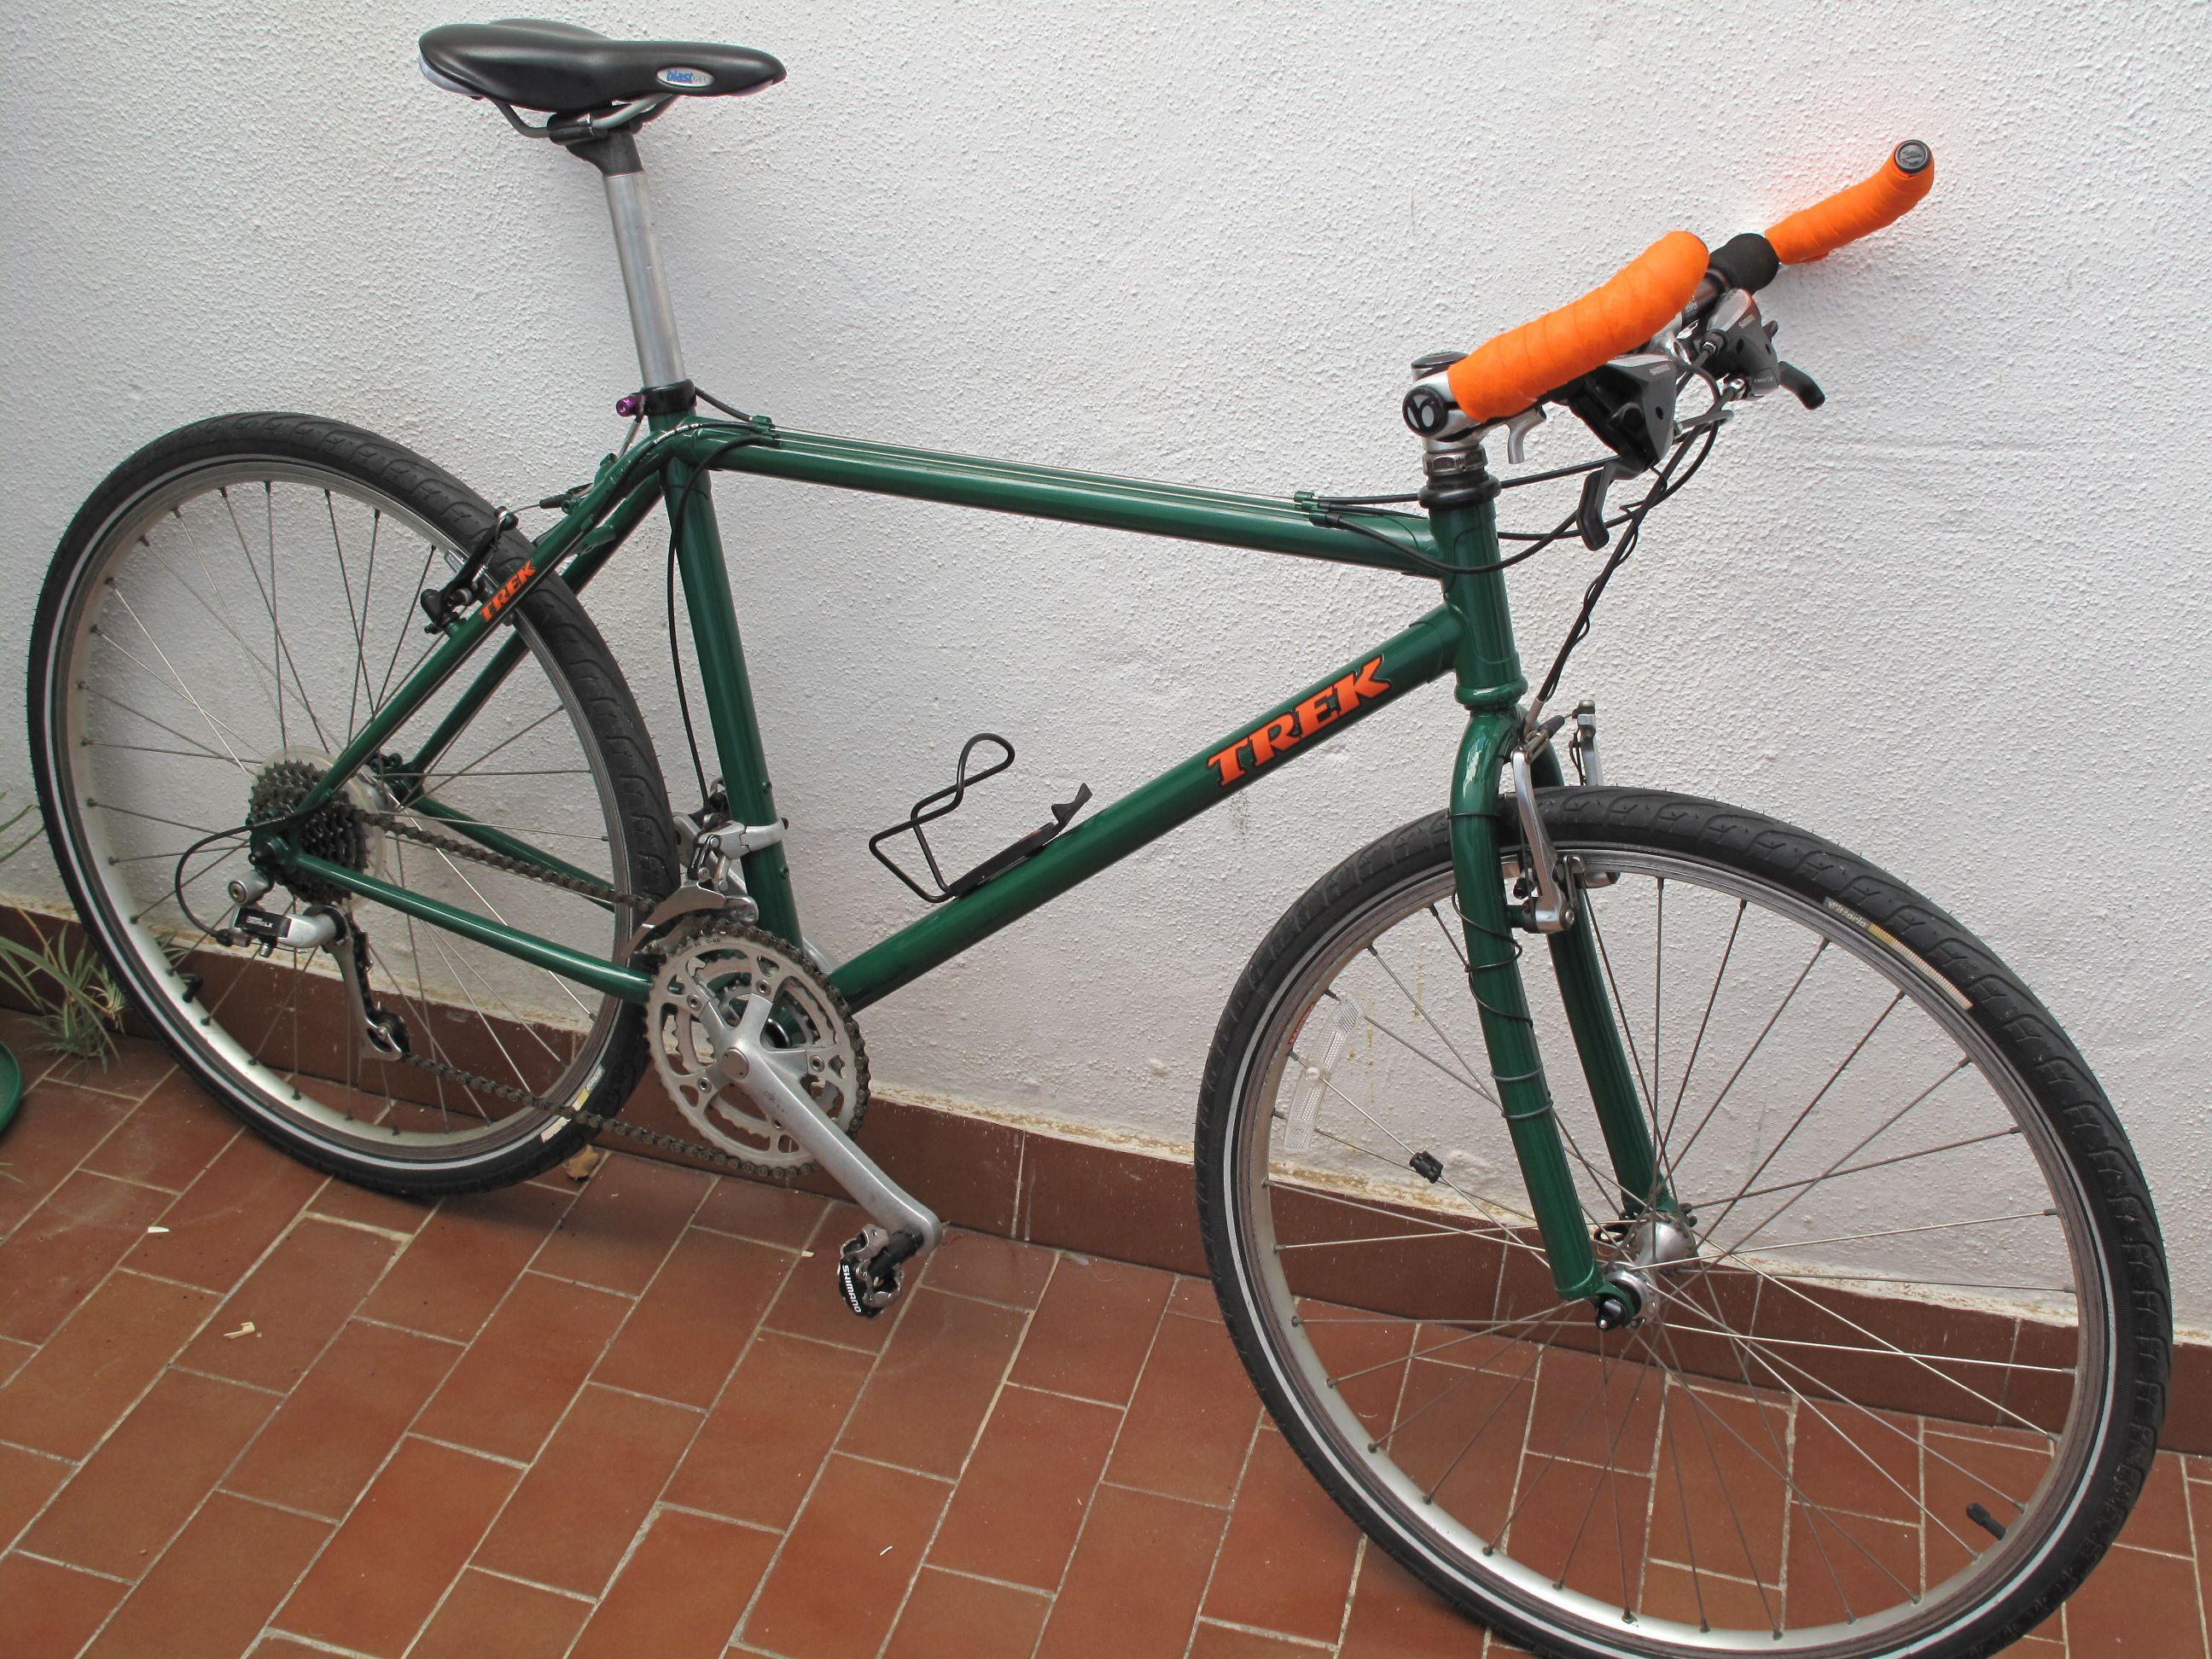 Trek Singletrack 950 Vintage Mountain Bike Bmx Bikes Vintage Mountain Bike Trek Mountain Bike